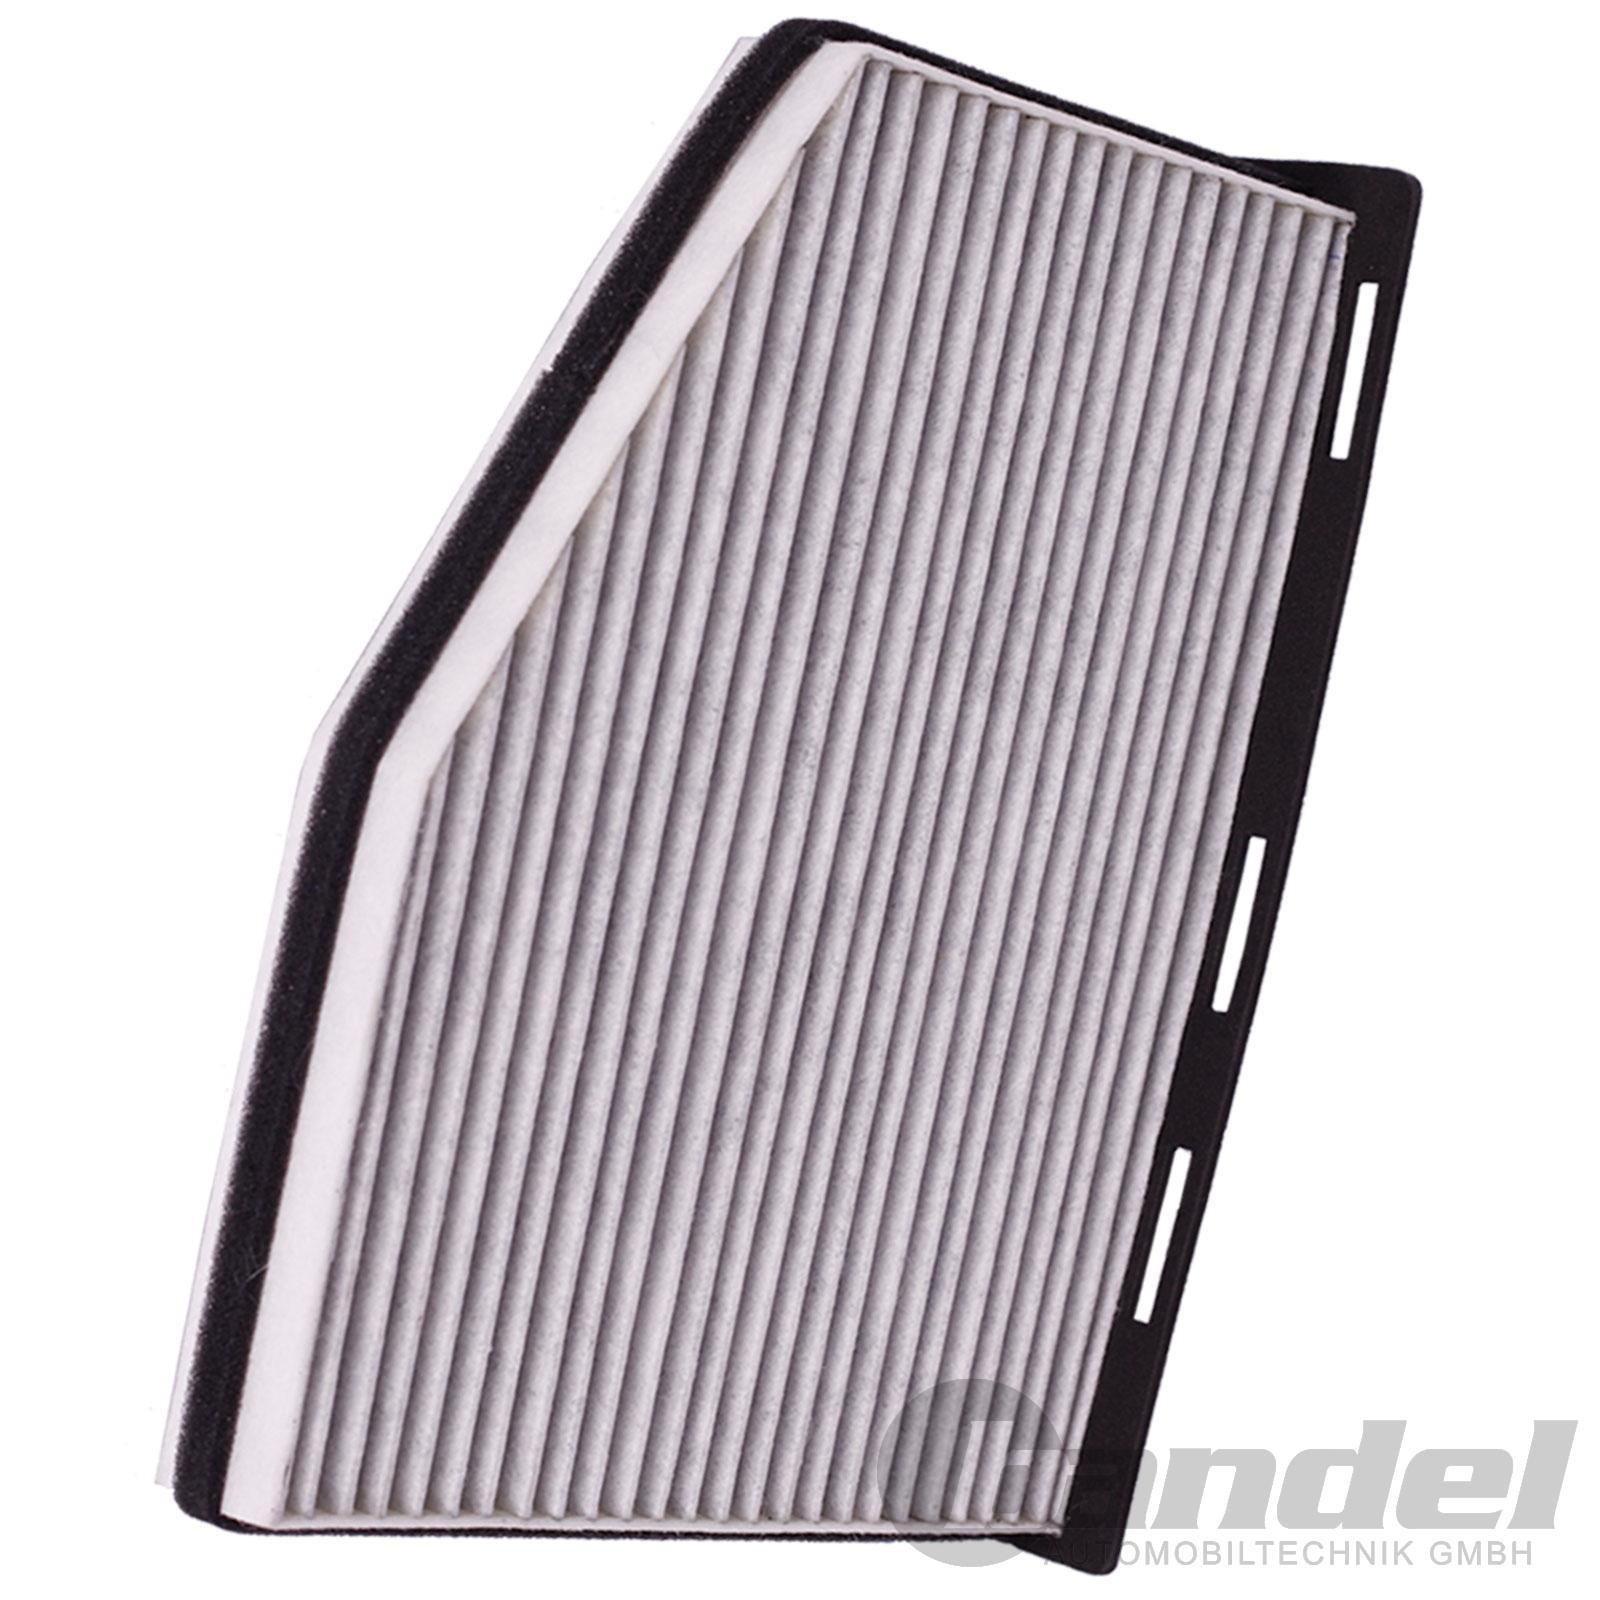 vw filterset inspektionspaket 5w30 castrol 1 9 2 0 tdi. Black Bedroom Furniture Sets. Home Design Ideas